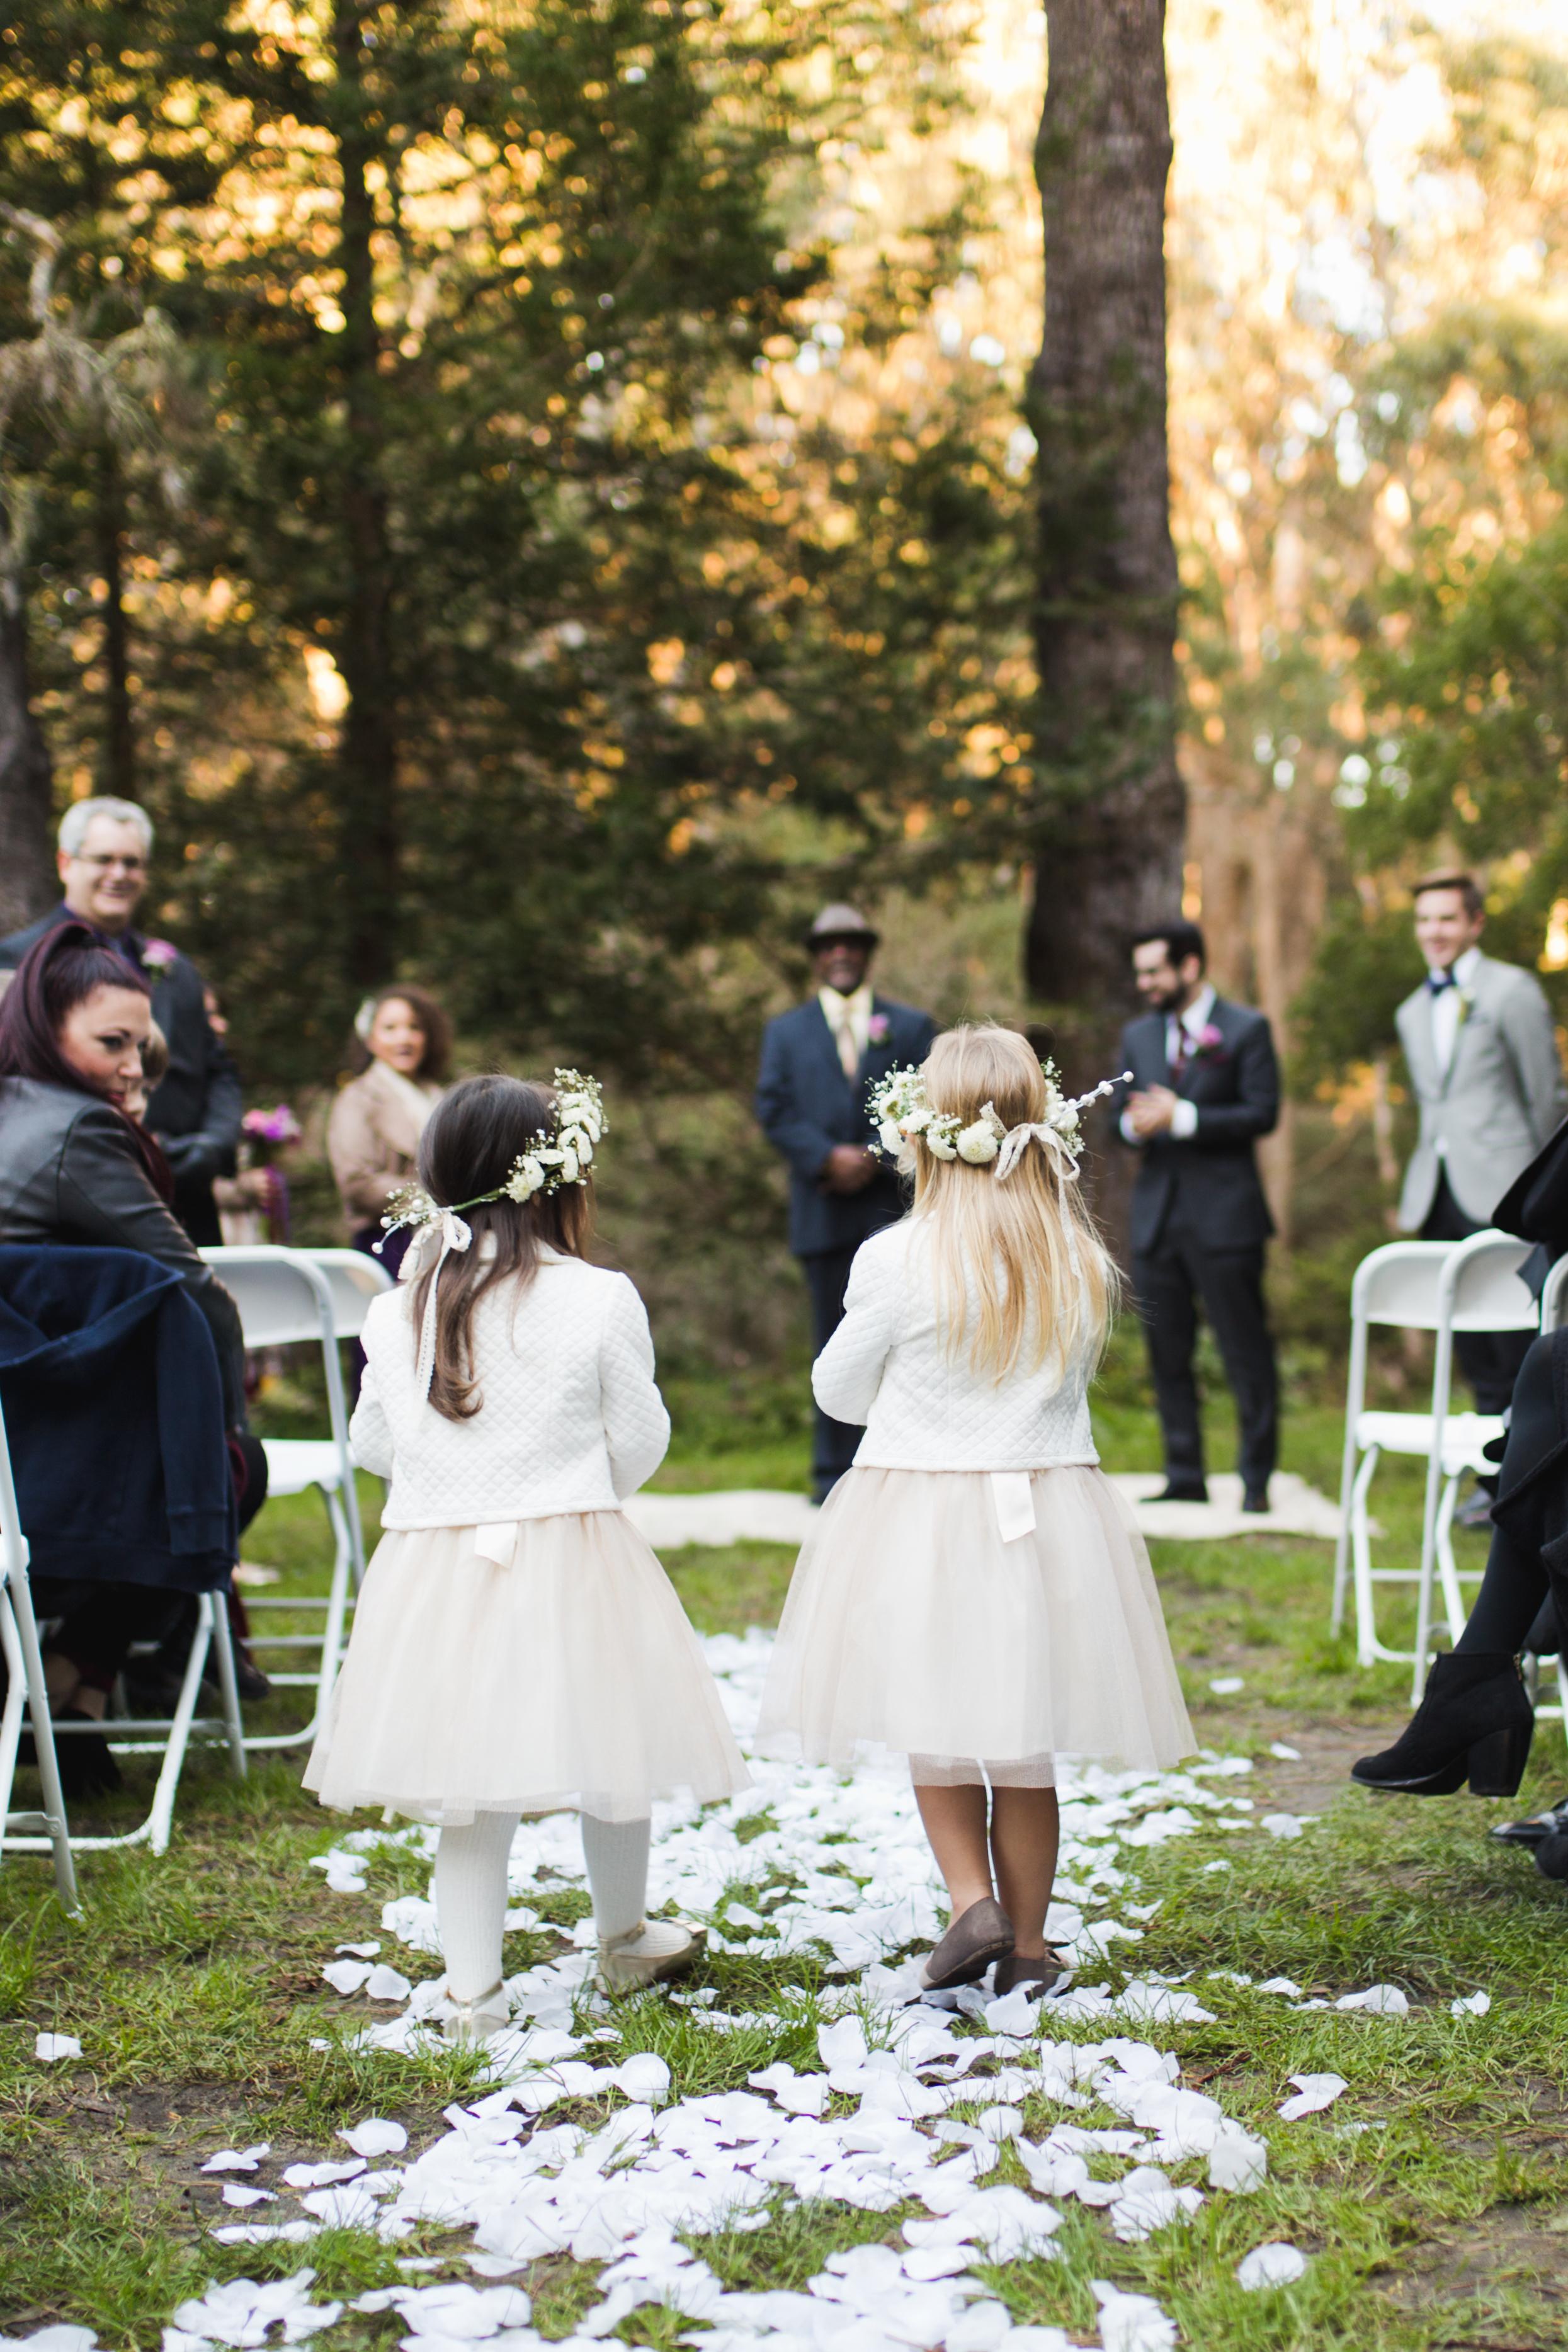 golden-gate-park-wedding-ceremony-flower-girls